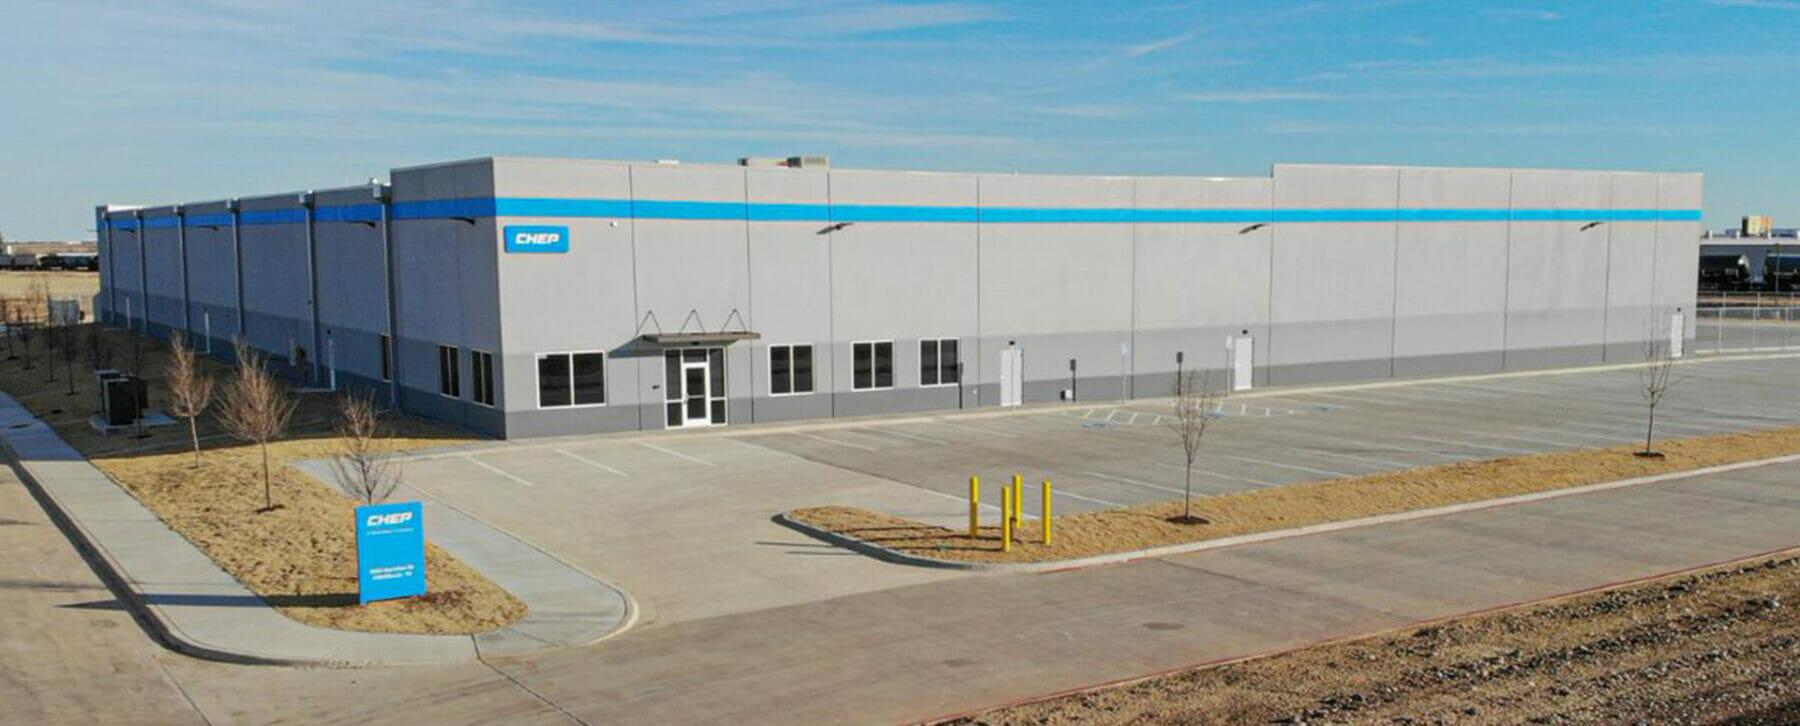 CHEP Warehouse - Amarillo, TX 4